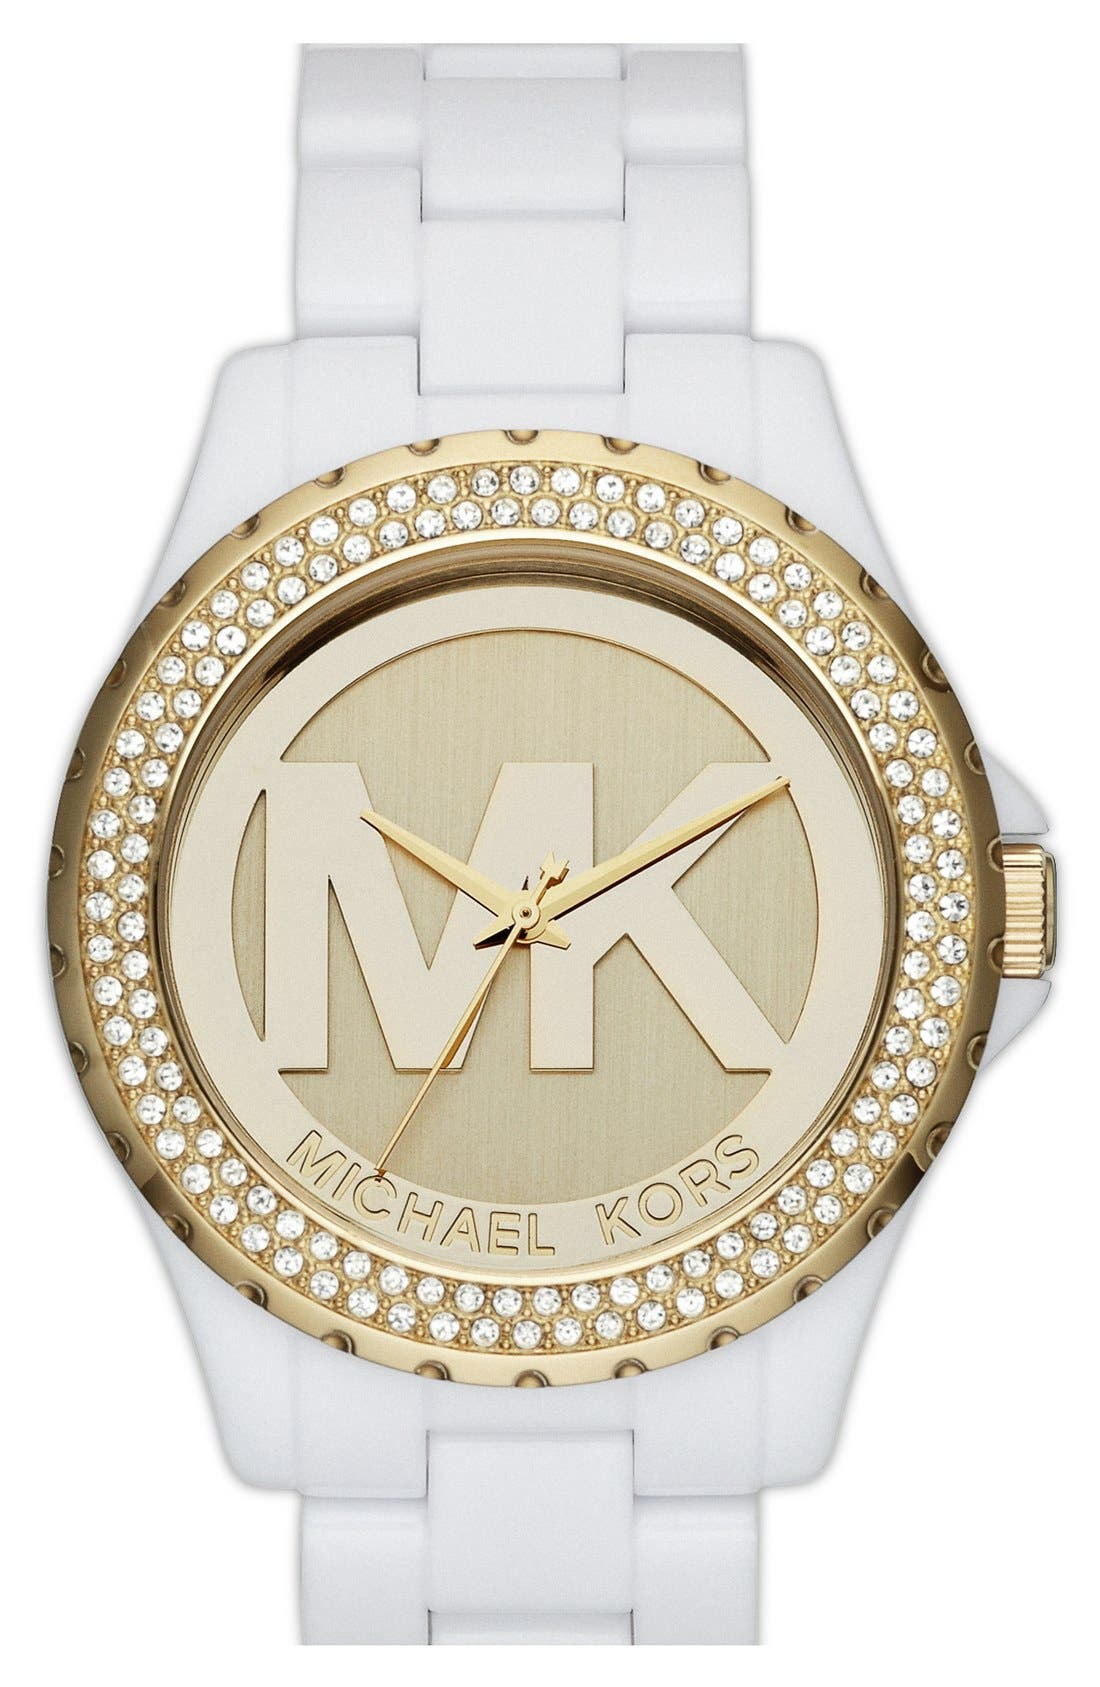 Alternate Image 1 Selected - Michael Kors 'Madison' Crystal Bezel Logo Watch, 42mm